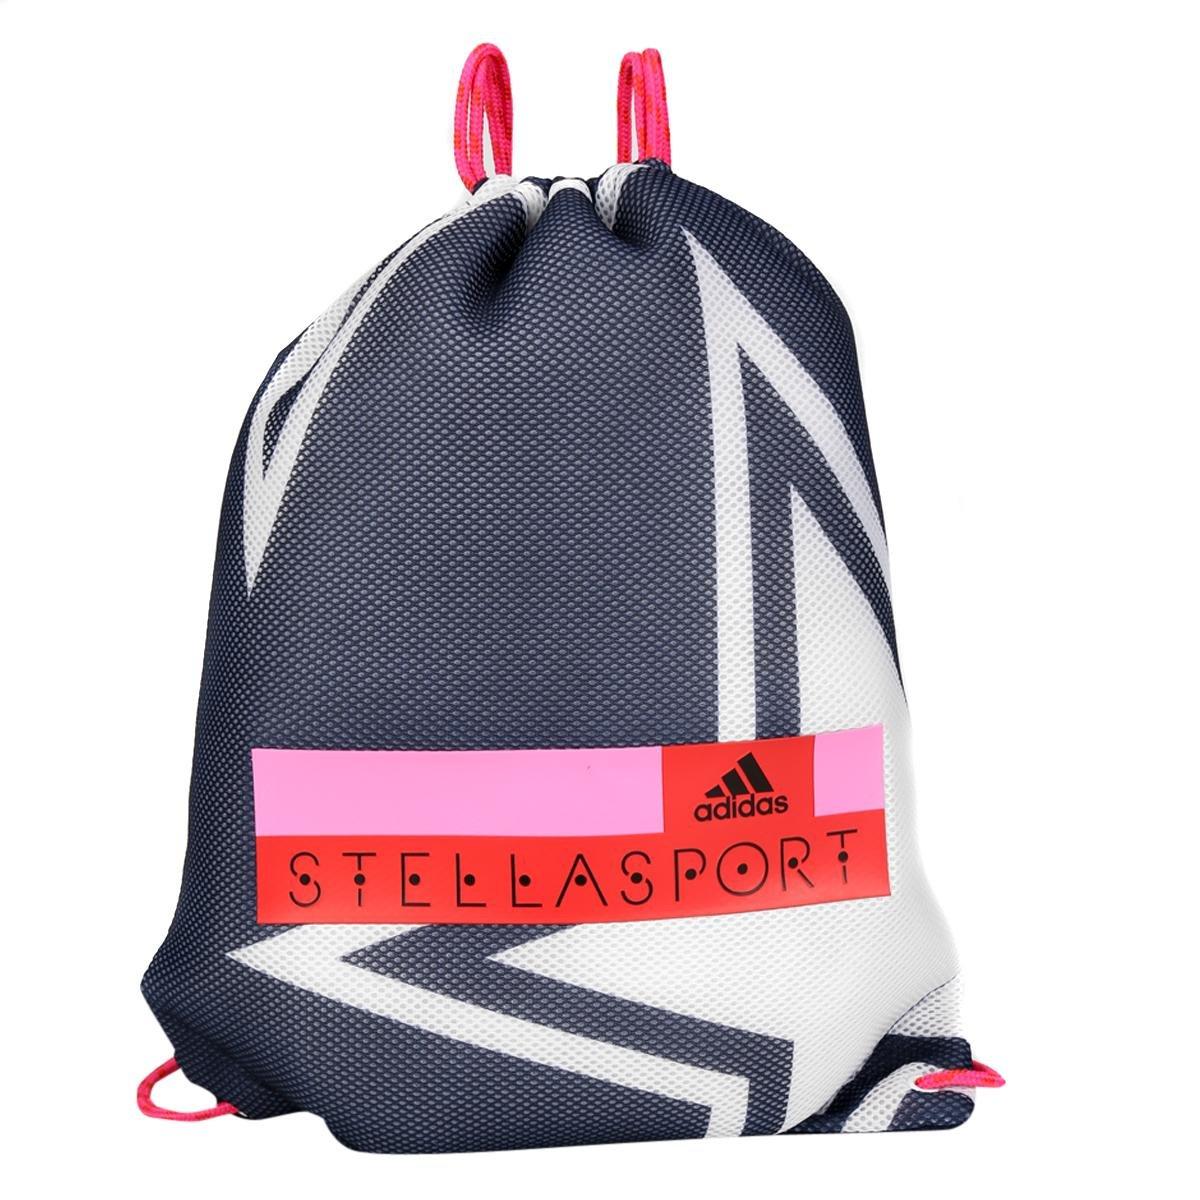 71b6e15da Sacola Adidas Stellasport Feminina - Compre Agora | Allianz Parque Shop